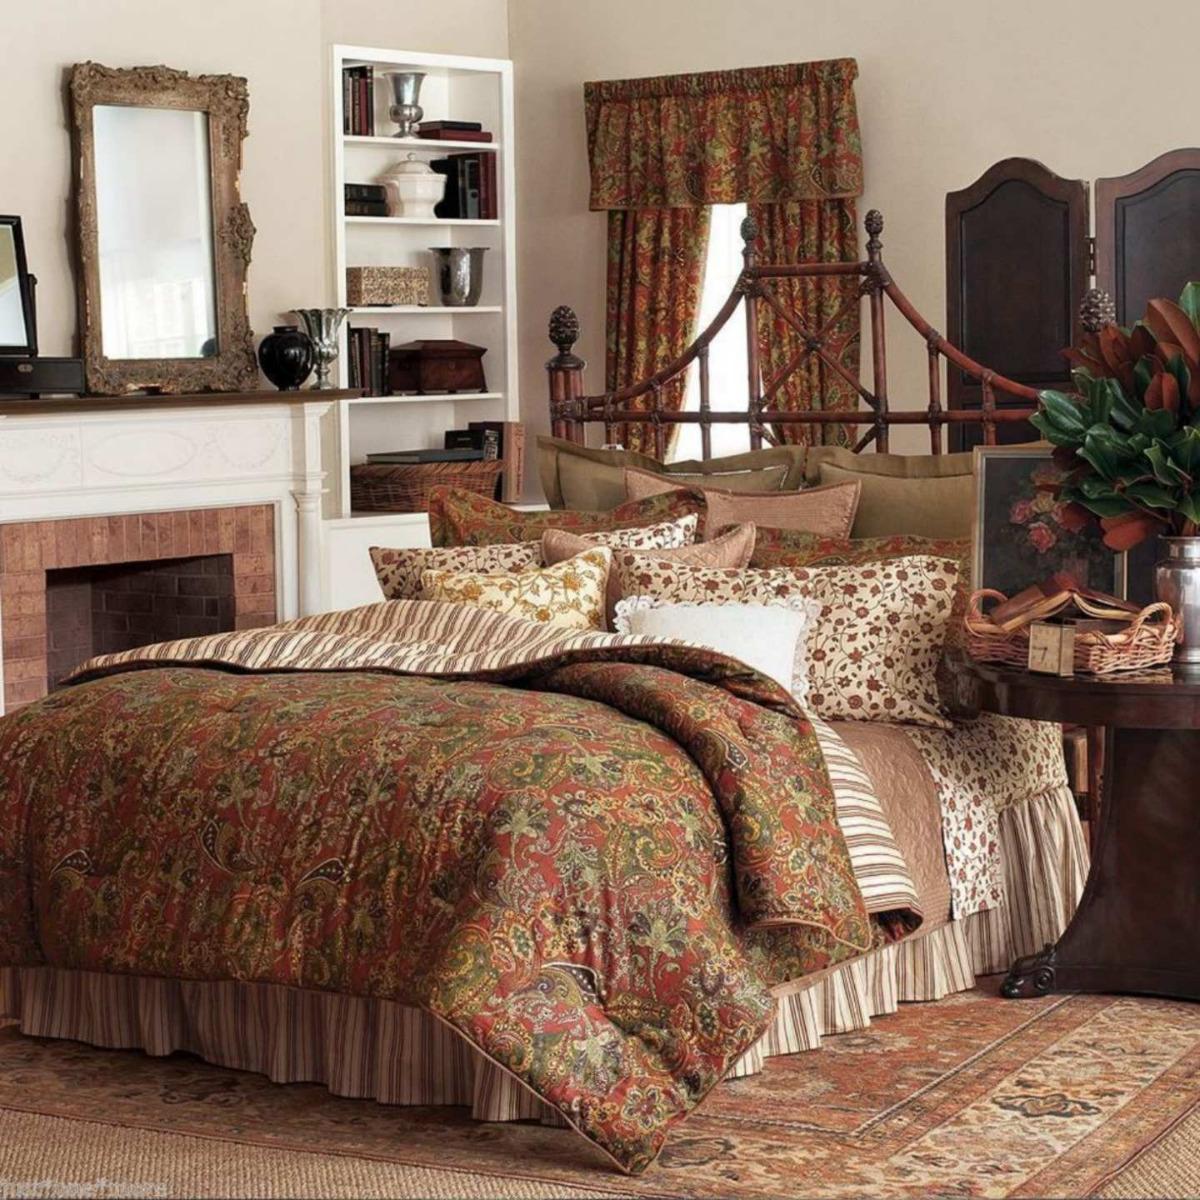 chaps ralph lauren-chandler matelasse coverlet bedspread paisley